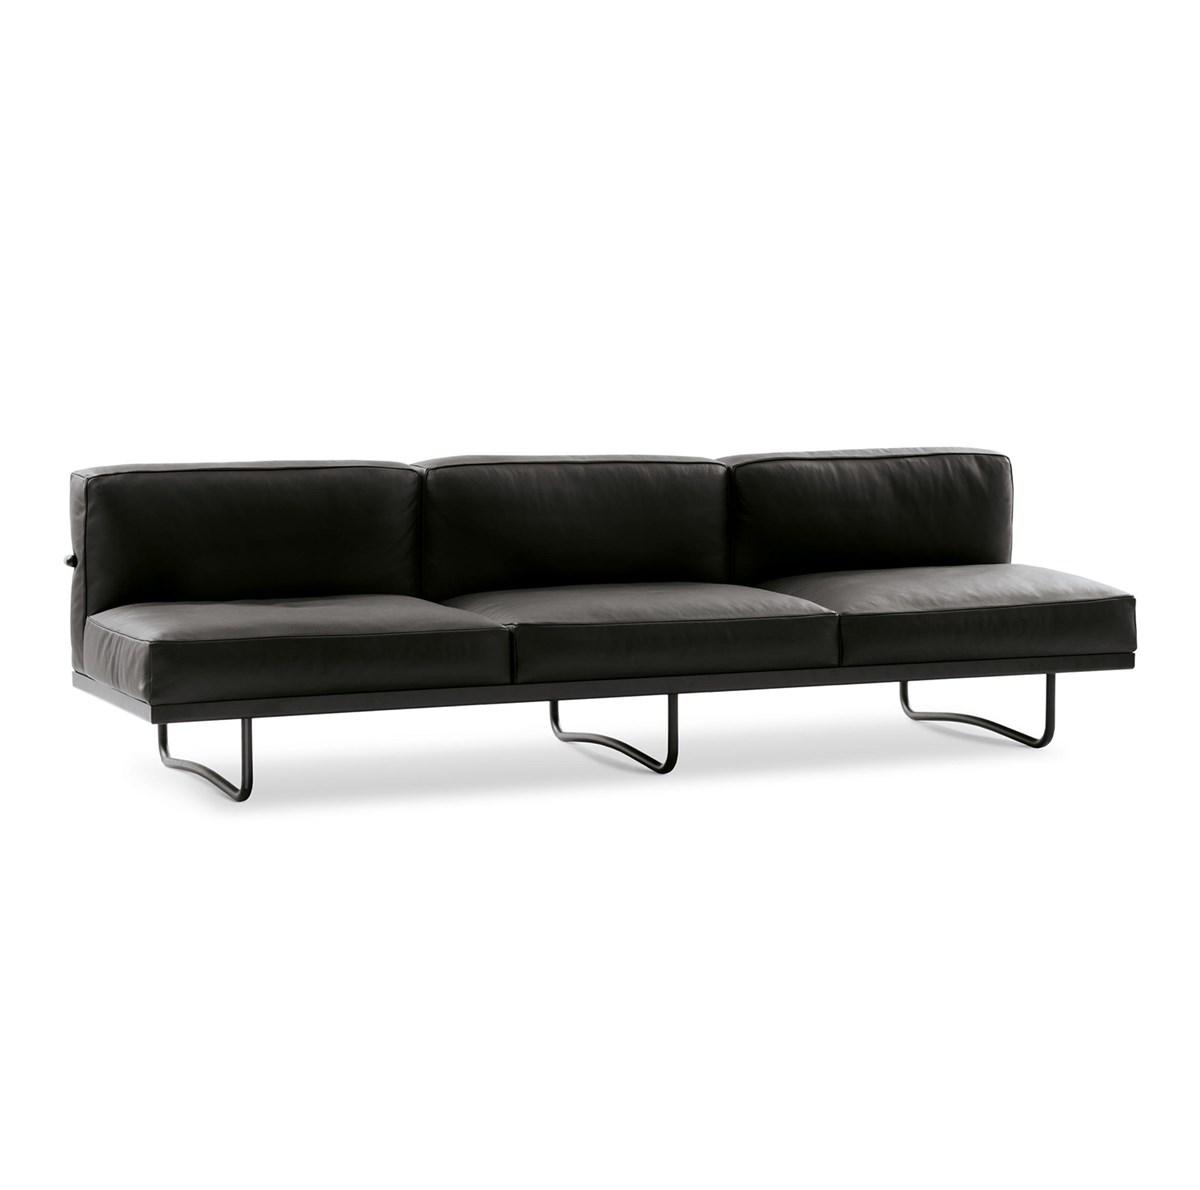 Cassina-Le Corbusier-Pierre Jeanneret-Charlotte-Perriand-LC5-Sofa-Matisse-1